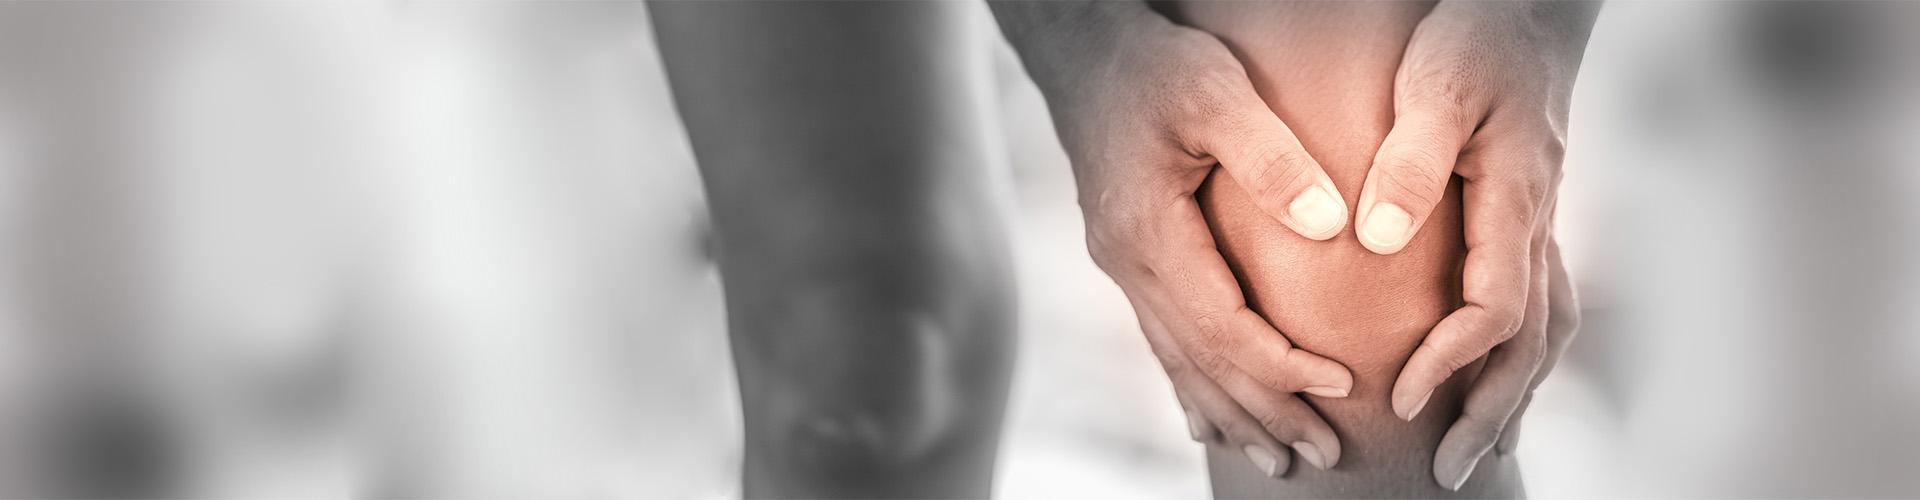 STIWELL Neurorehabilitation | information about meniscus rupture